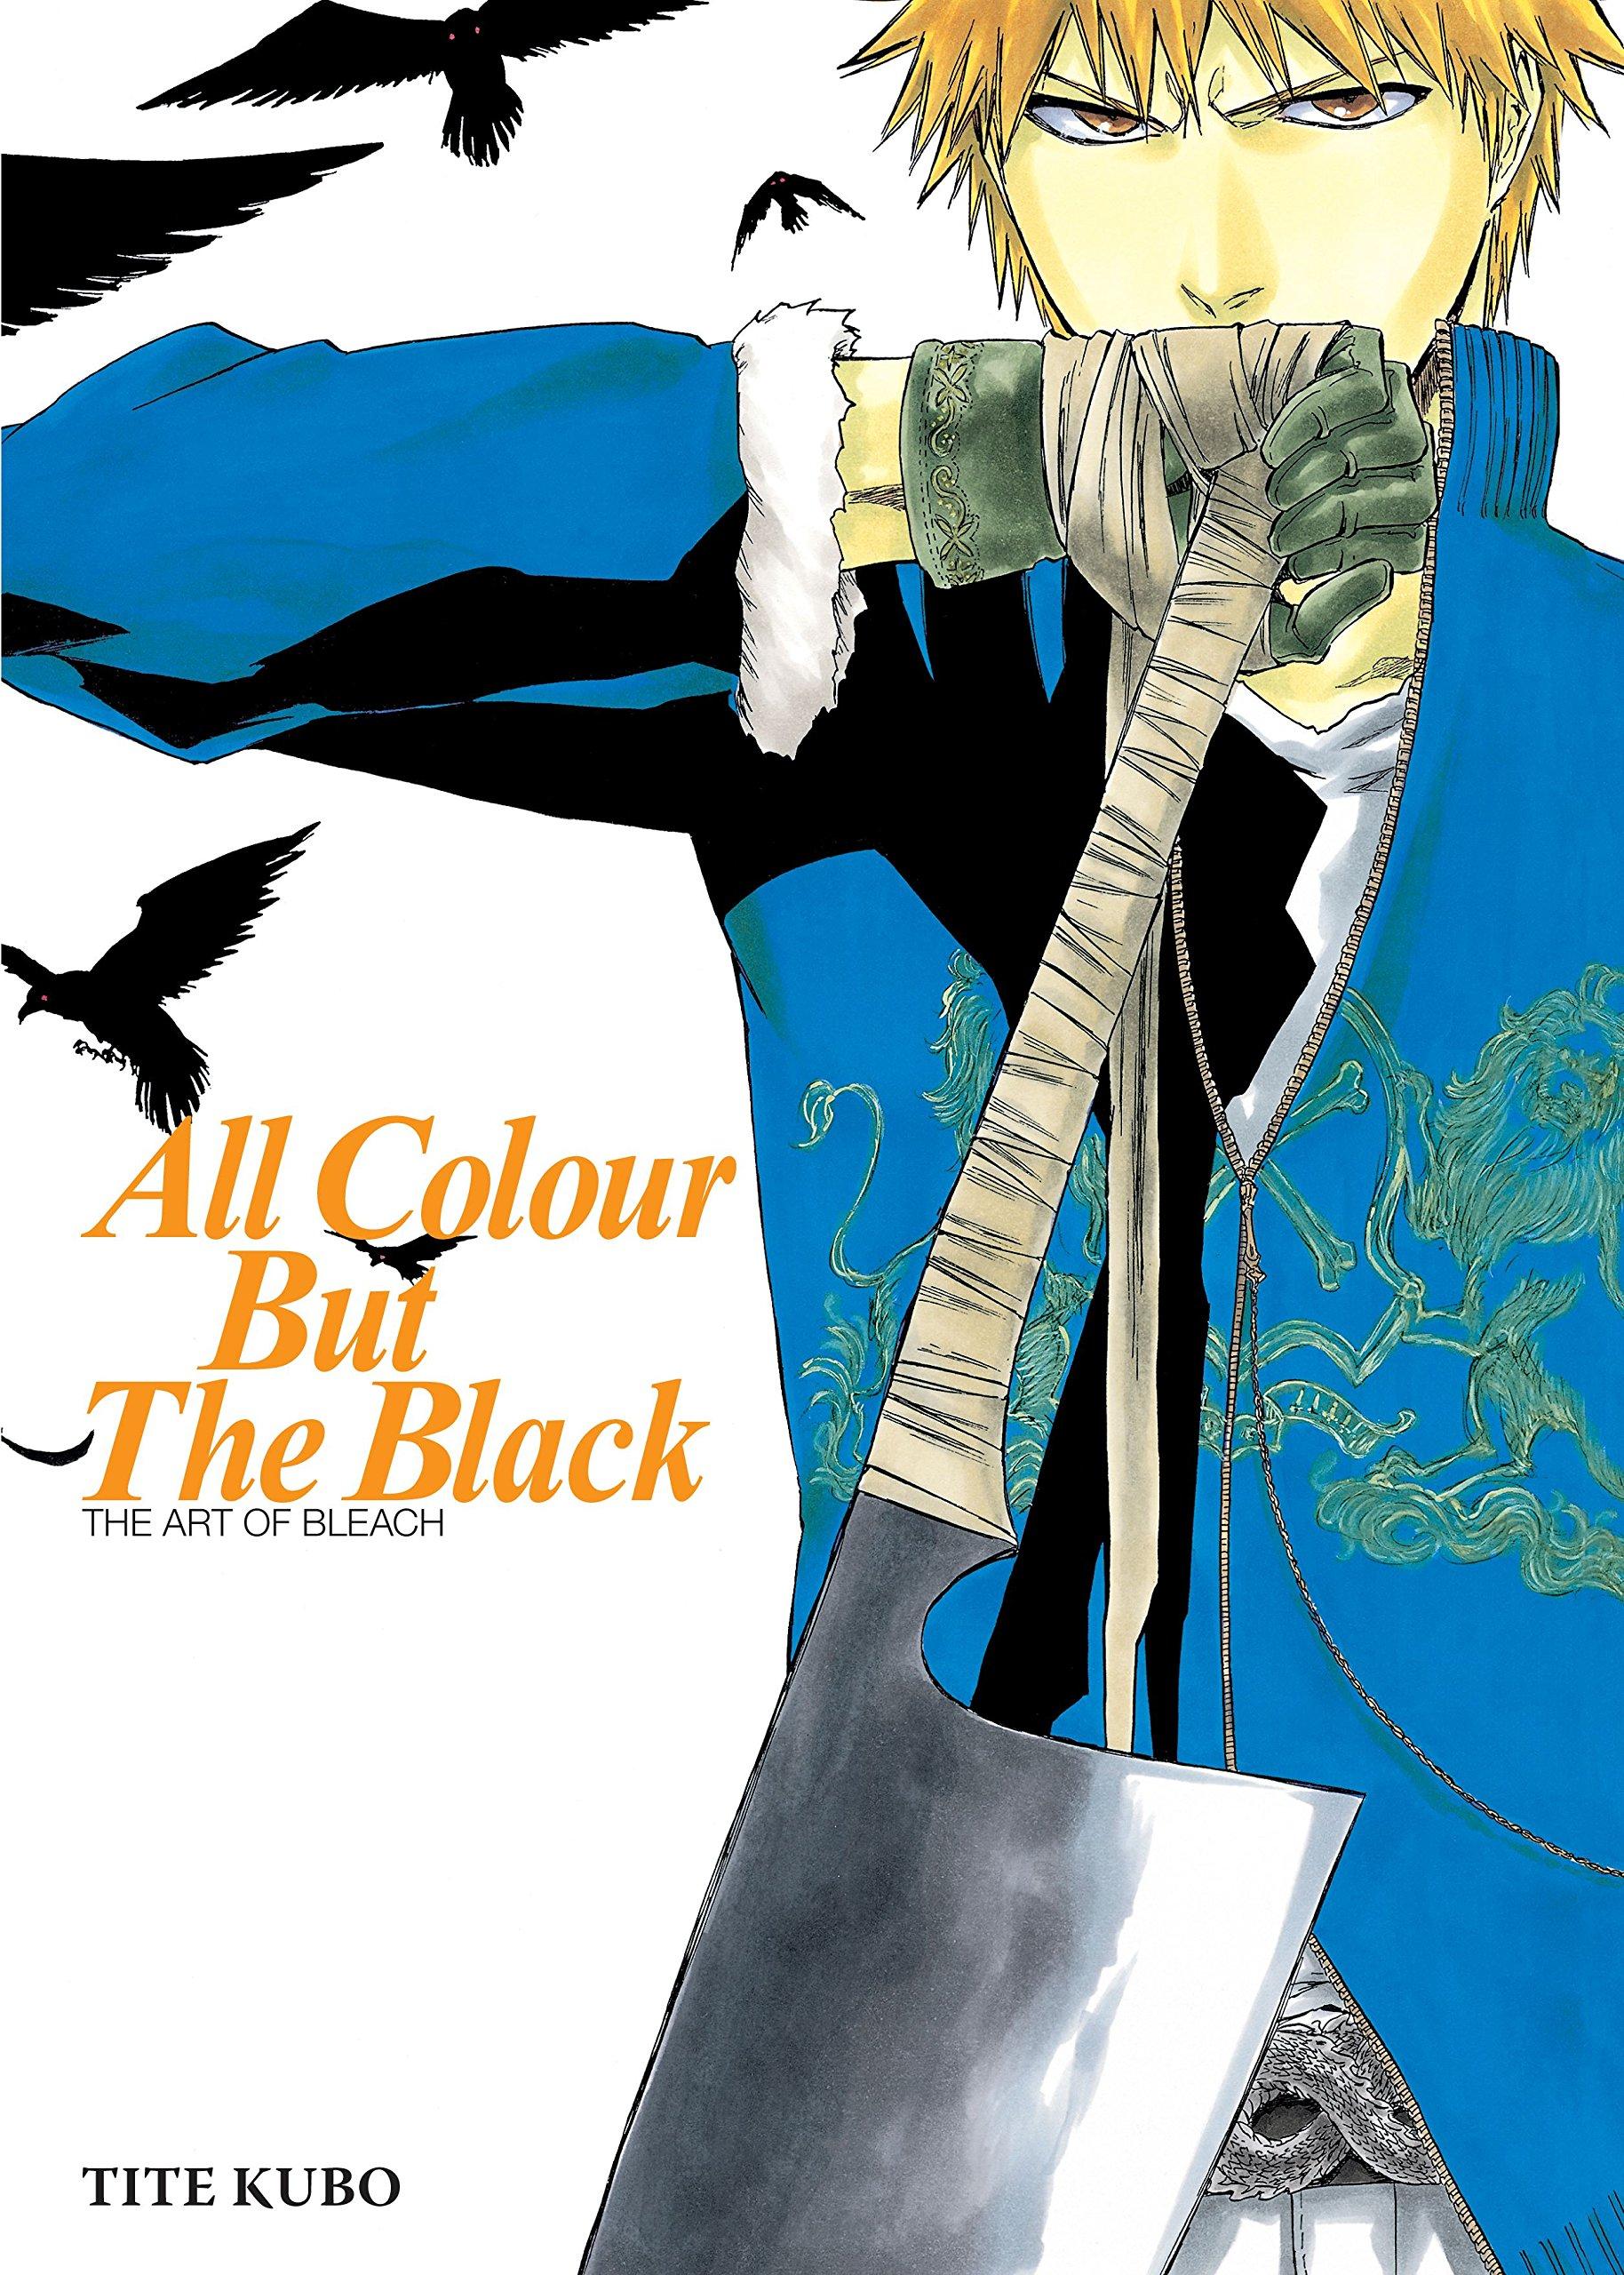 Colour book art - Amazon Com All Colour But The Black The Art Of Bleach 9781421518848 Tite Kubo Books